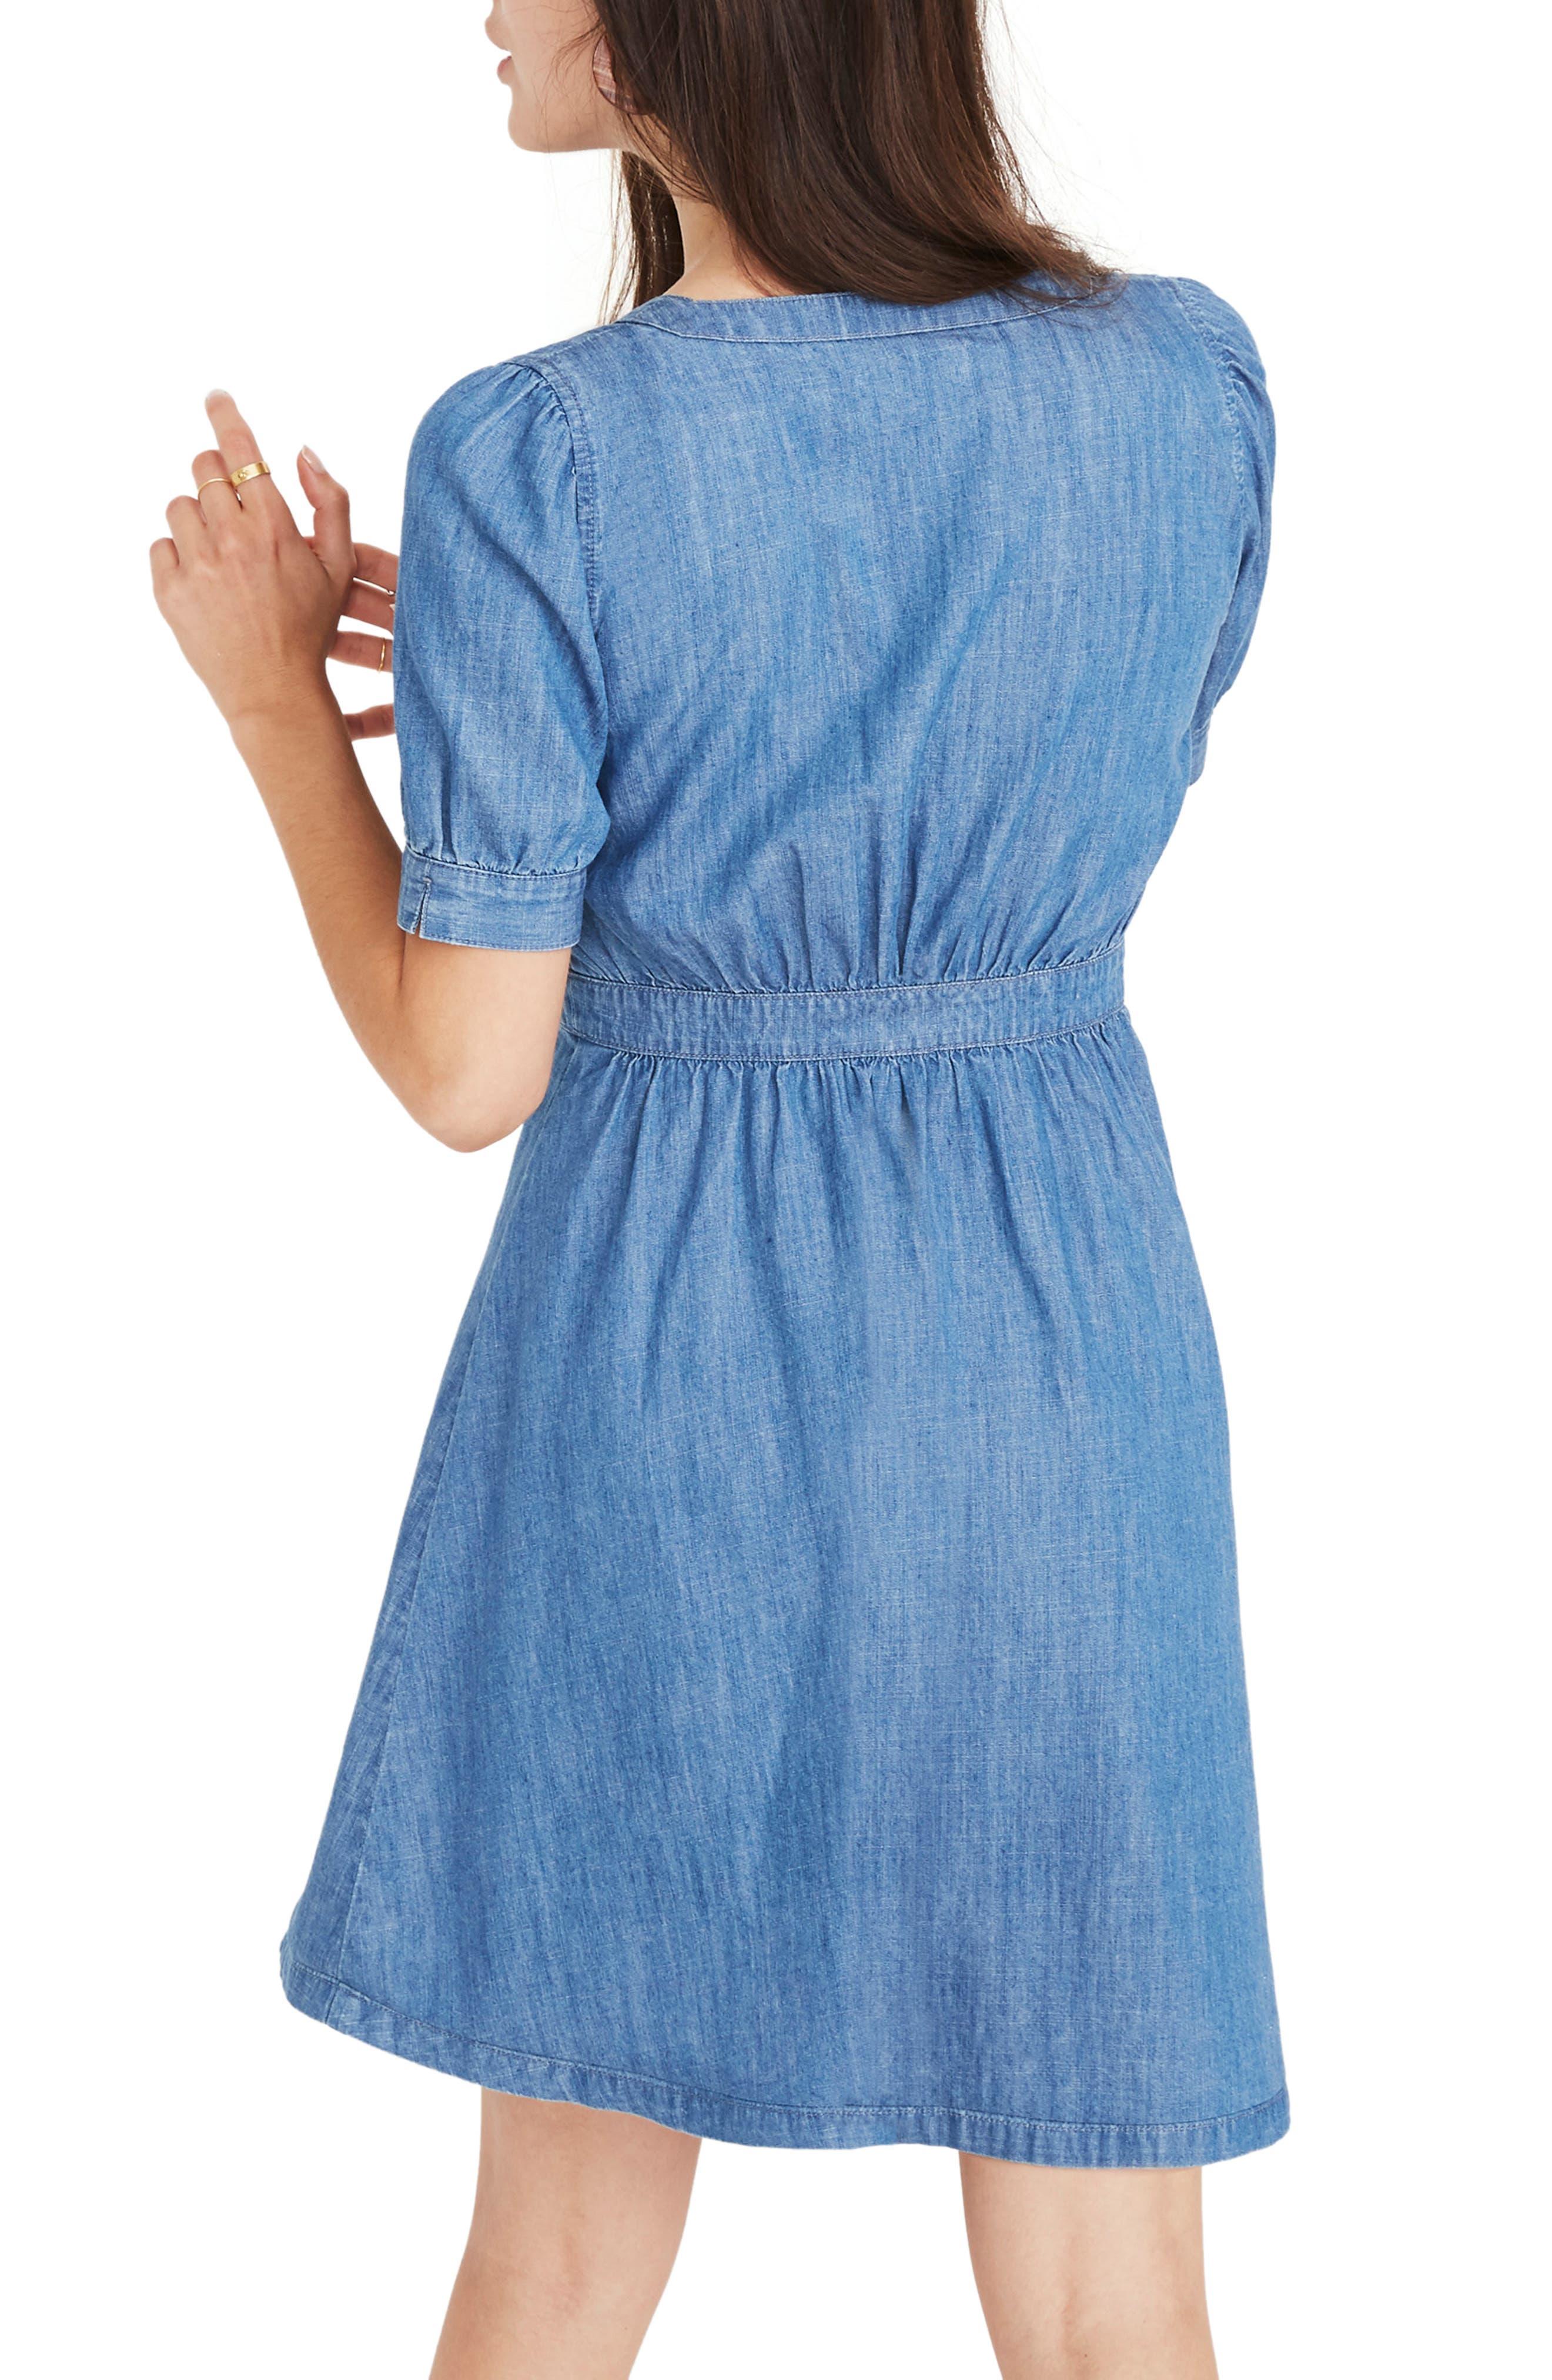 Denim Daylily Dress,                             Alternate thumbnail 3, color,                             ANNETTA WASH